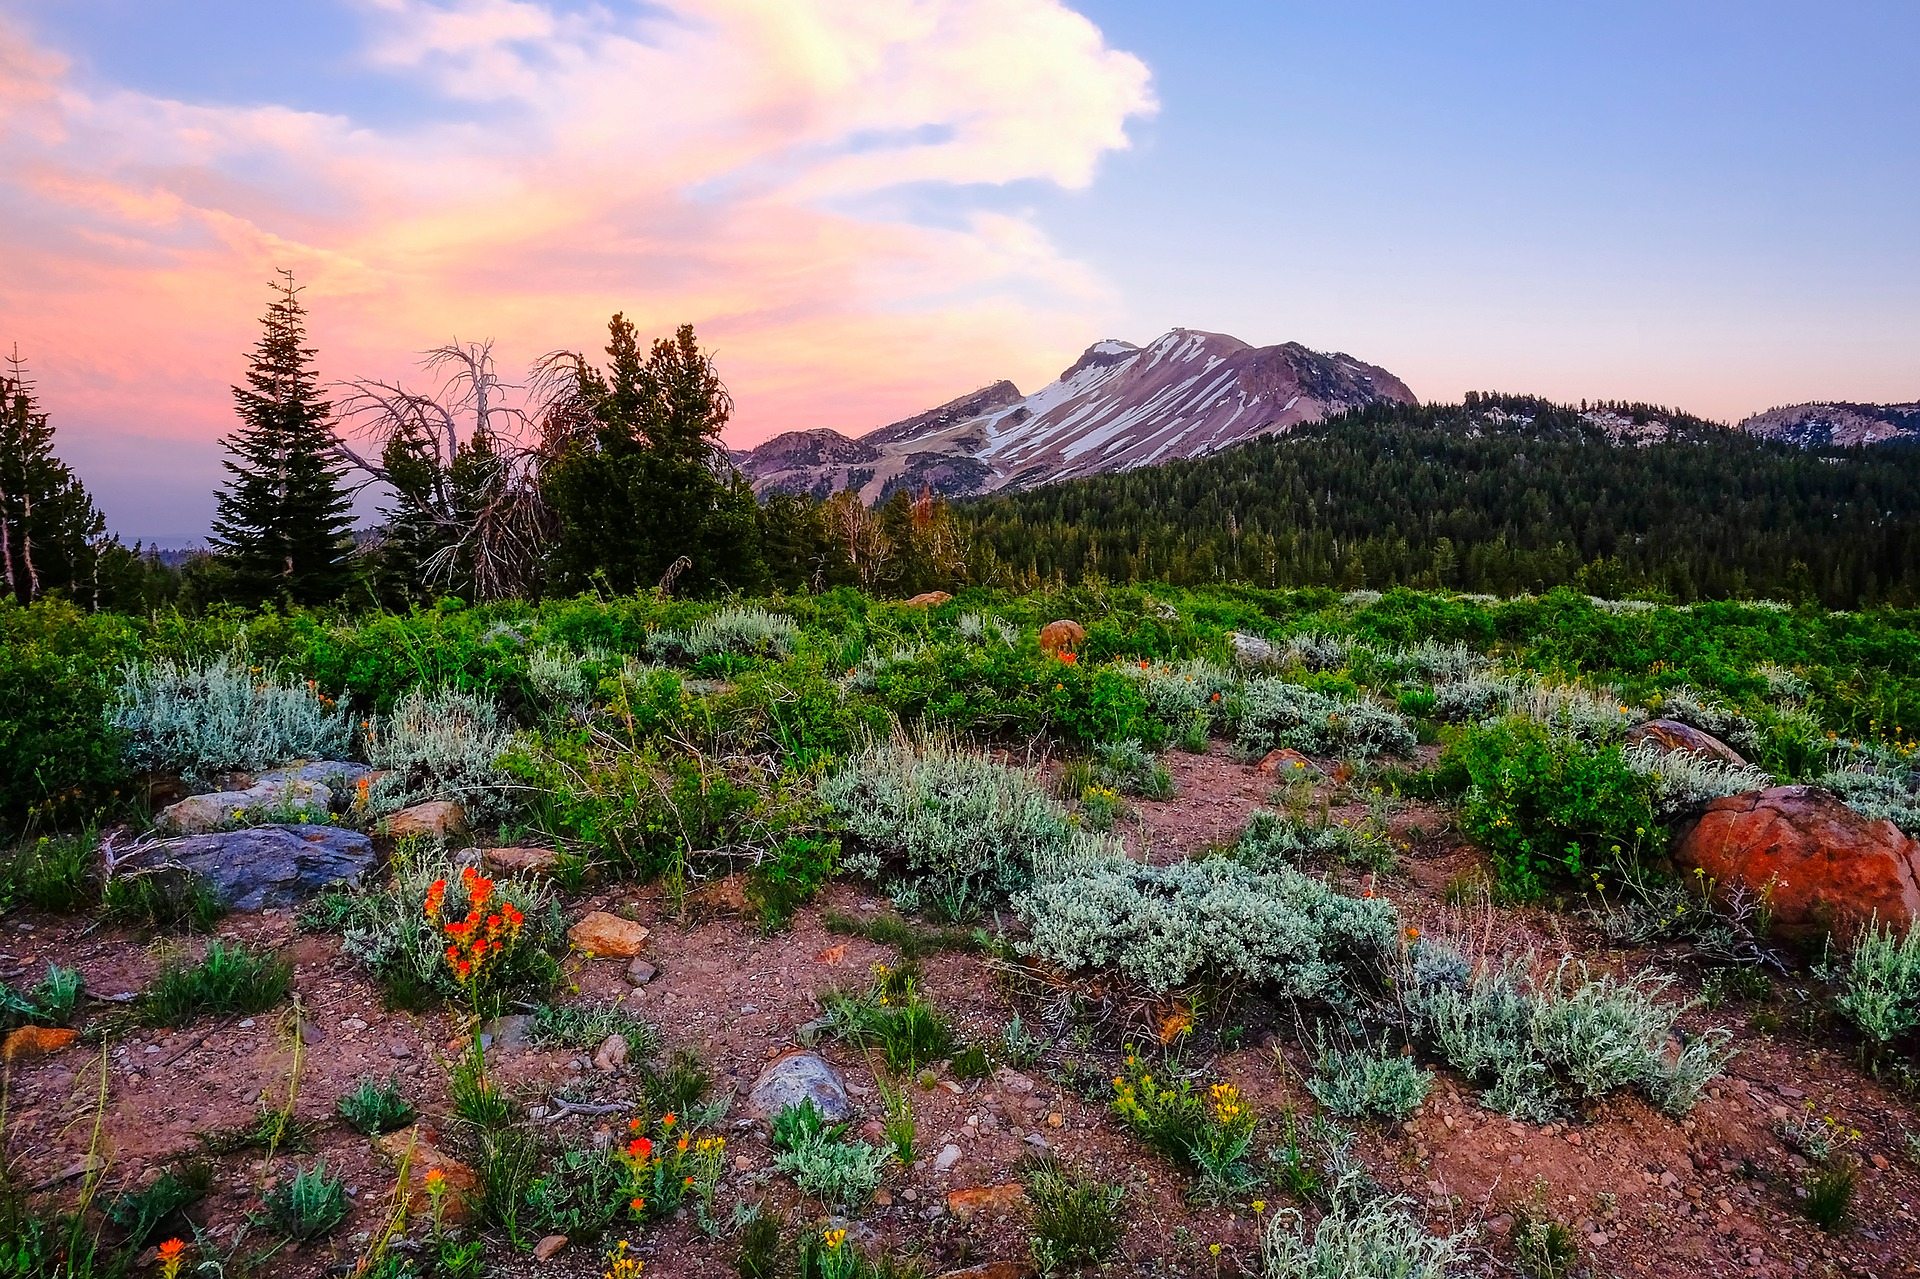 Flowers at Yosemite National Park in California, USA